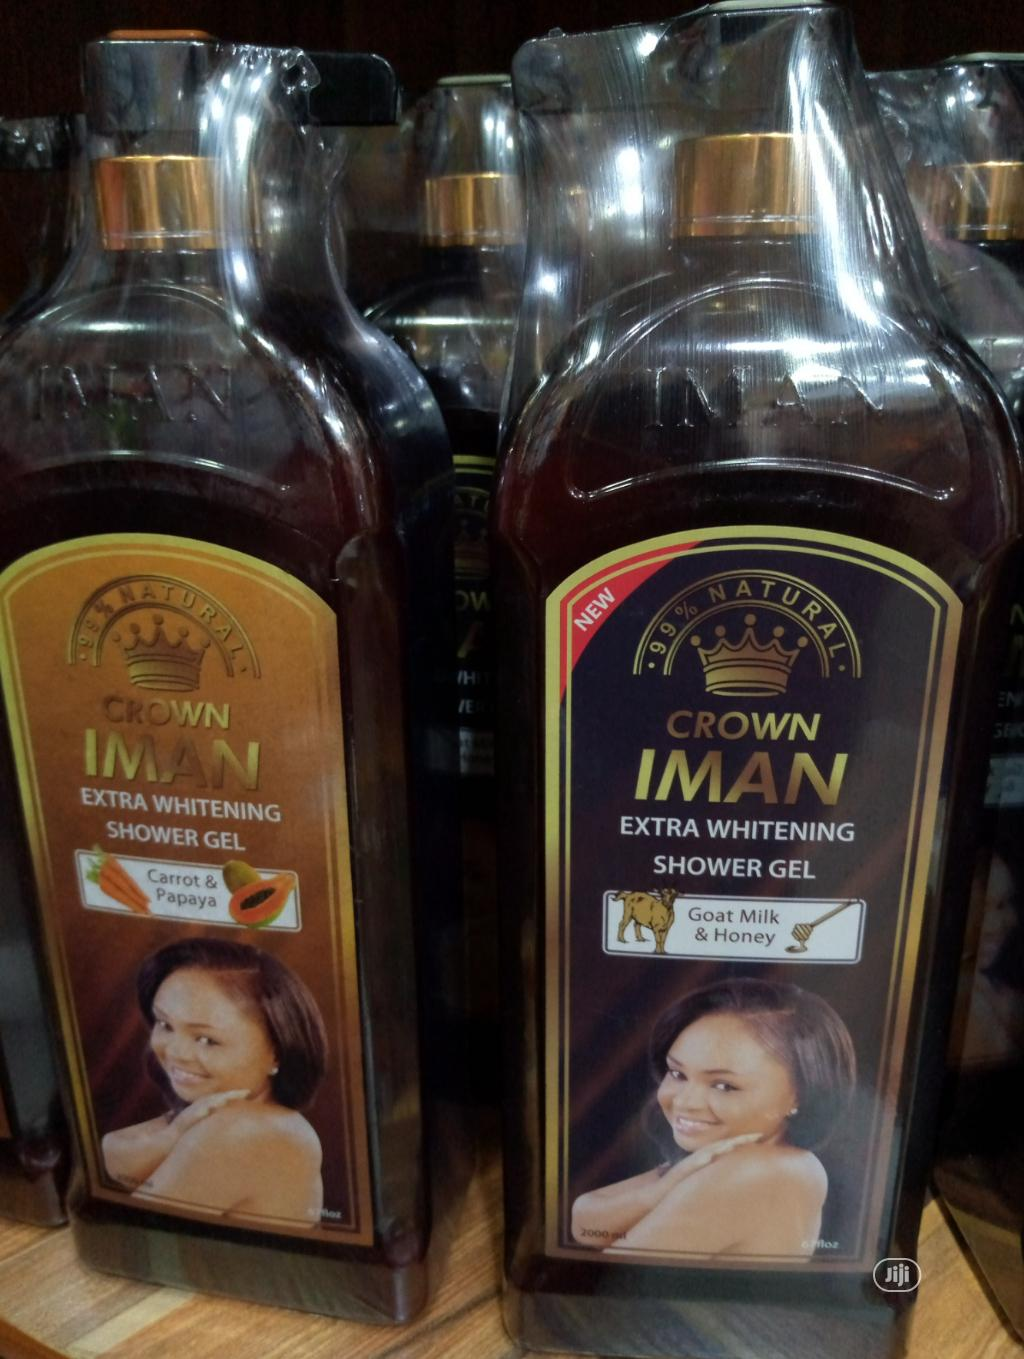 Iman Shower Gel